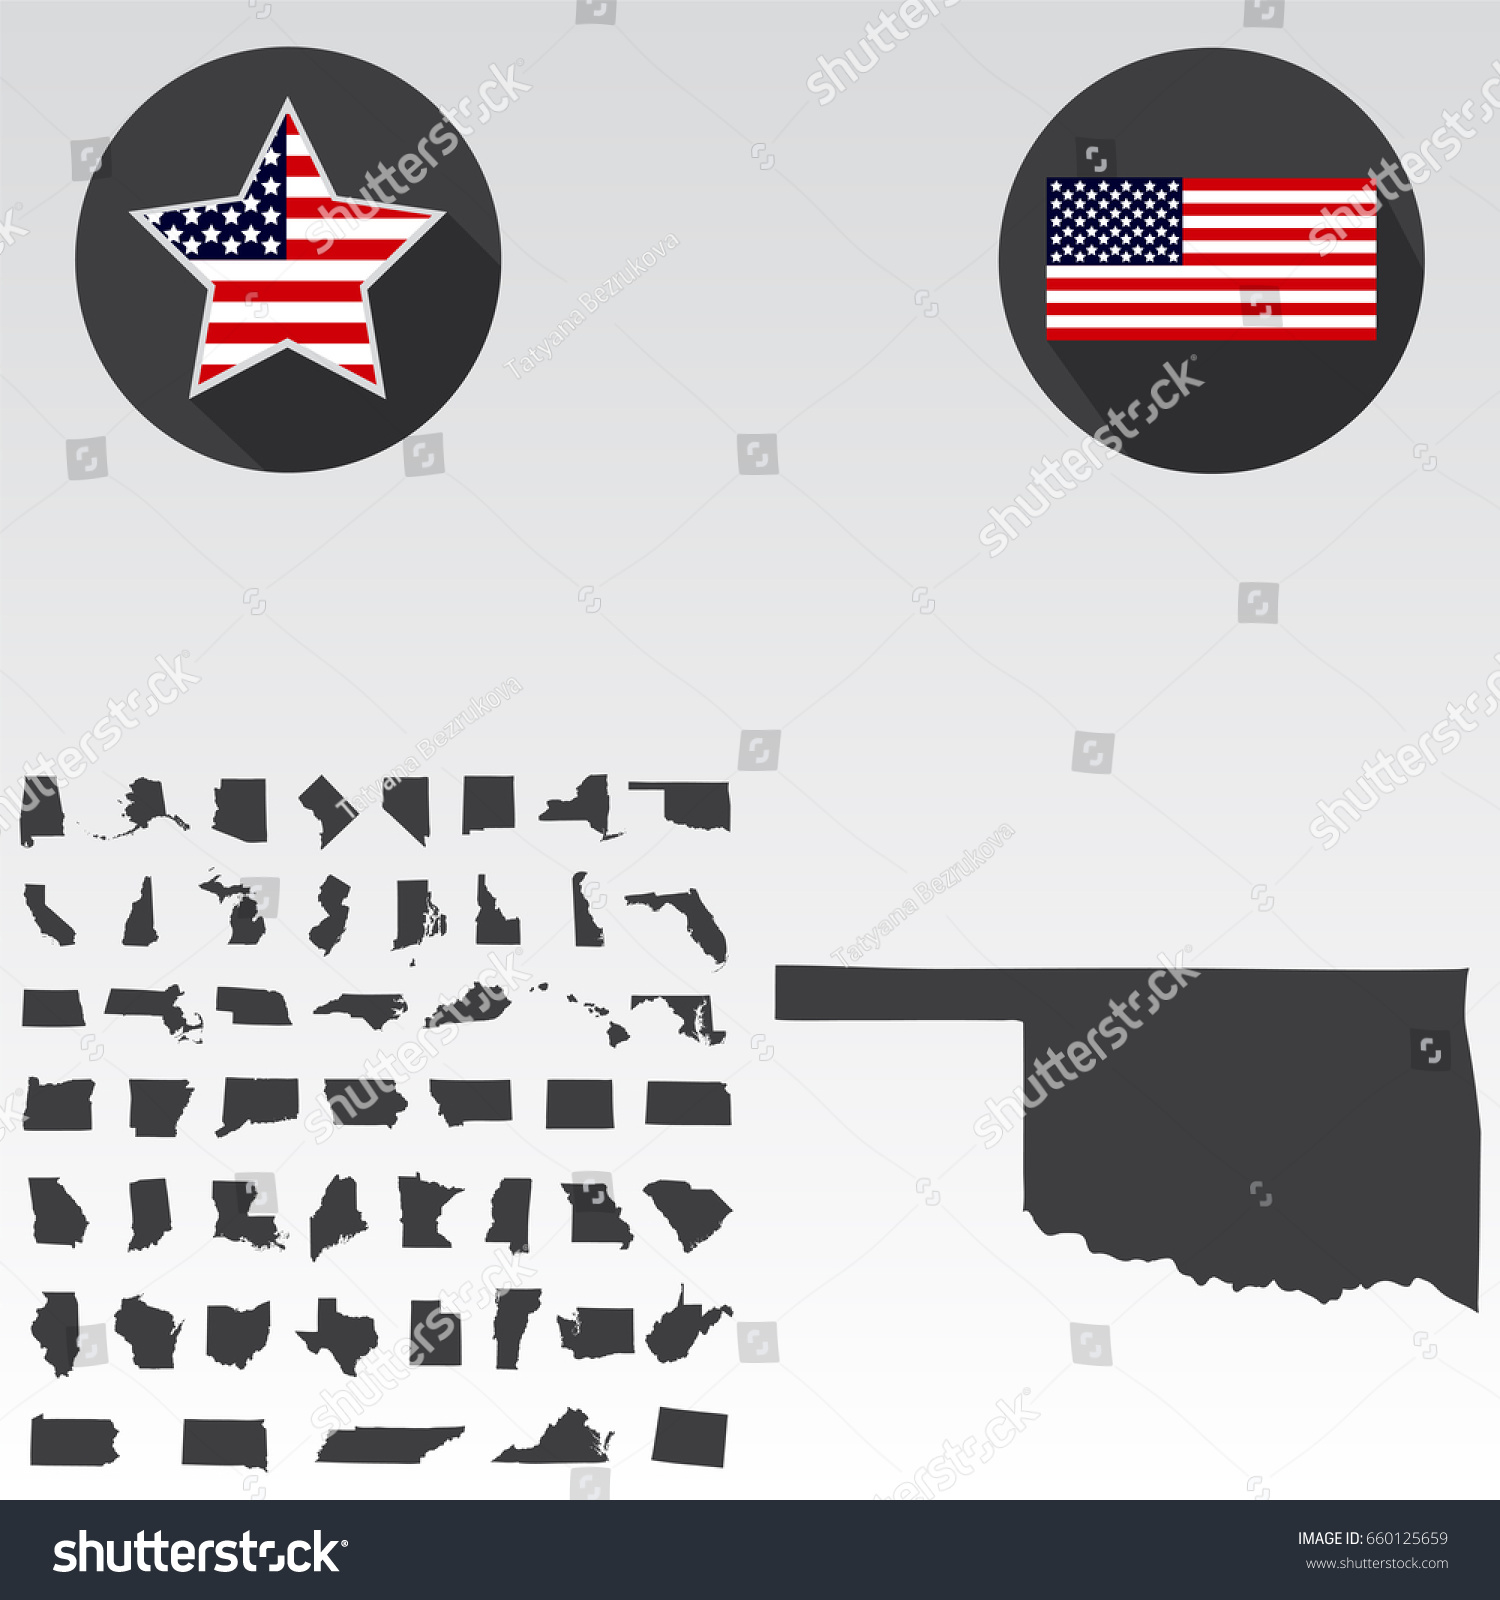 Oklahoma Location On The US Map Oklahoma City Map Usa My Blog US - Oklahoma in us map